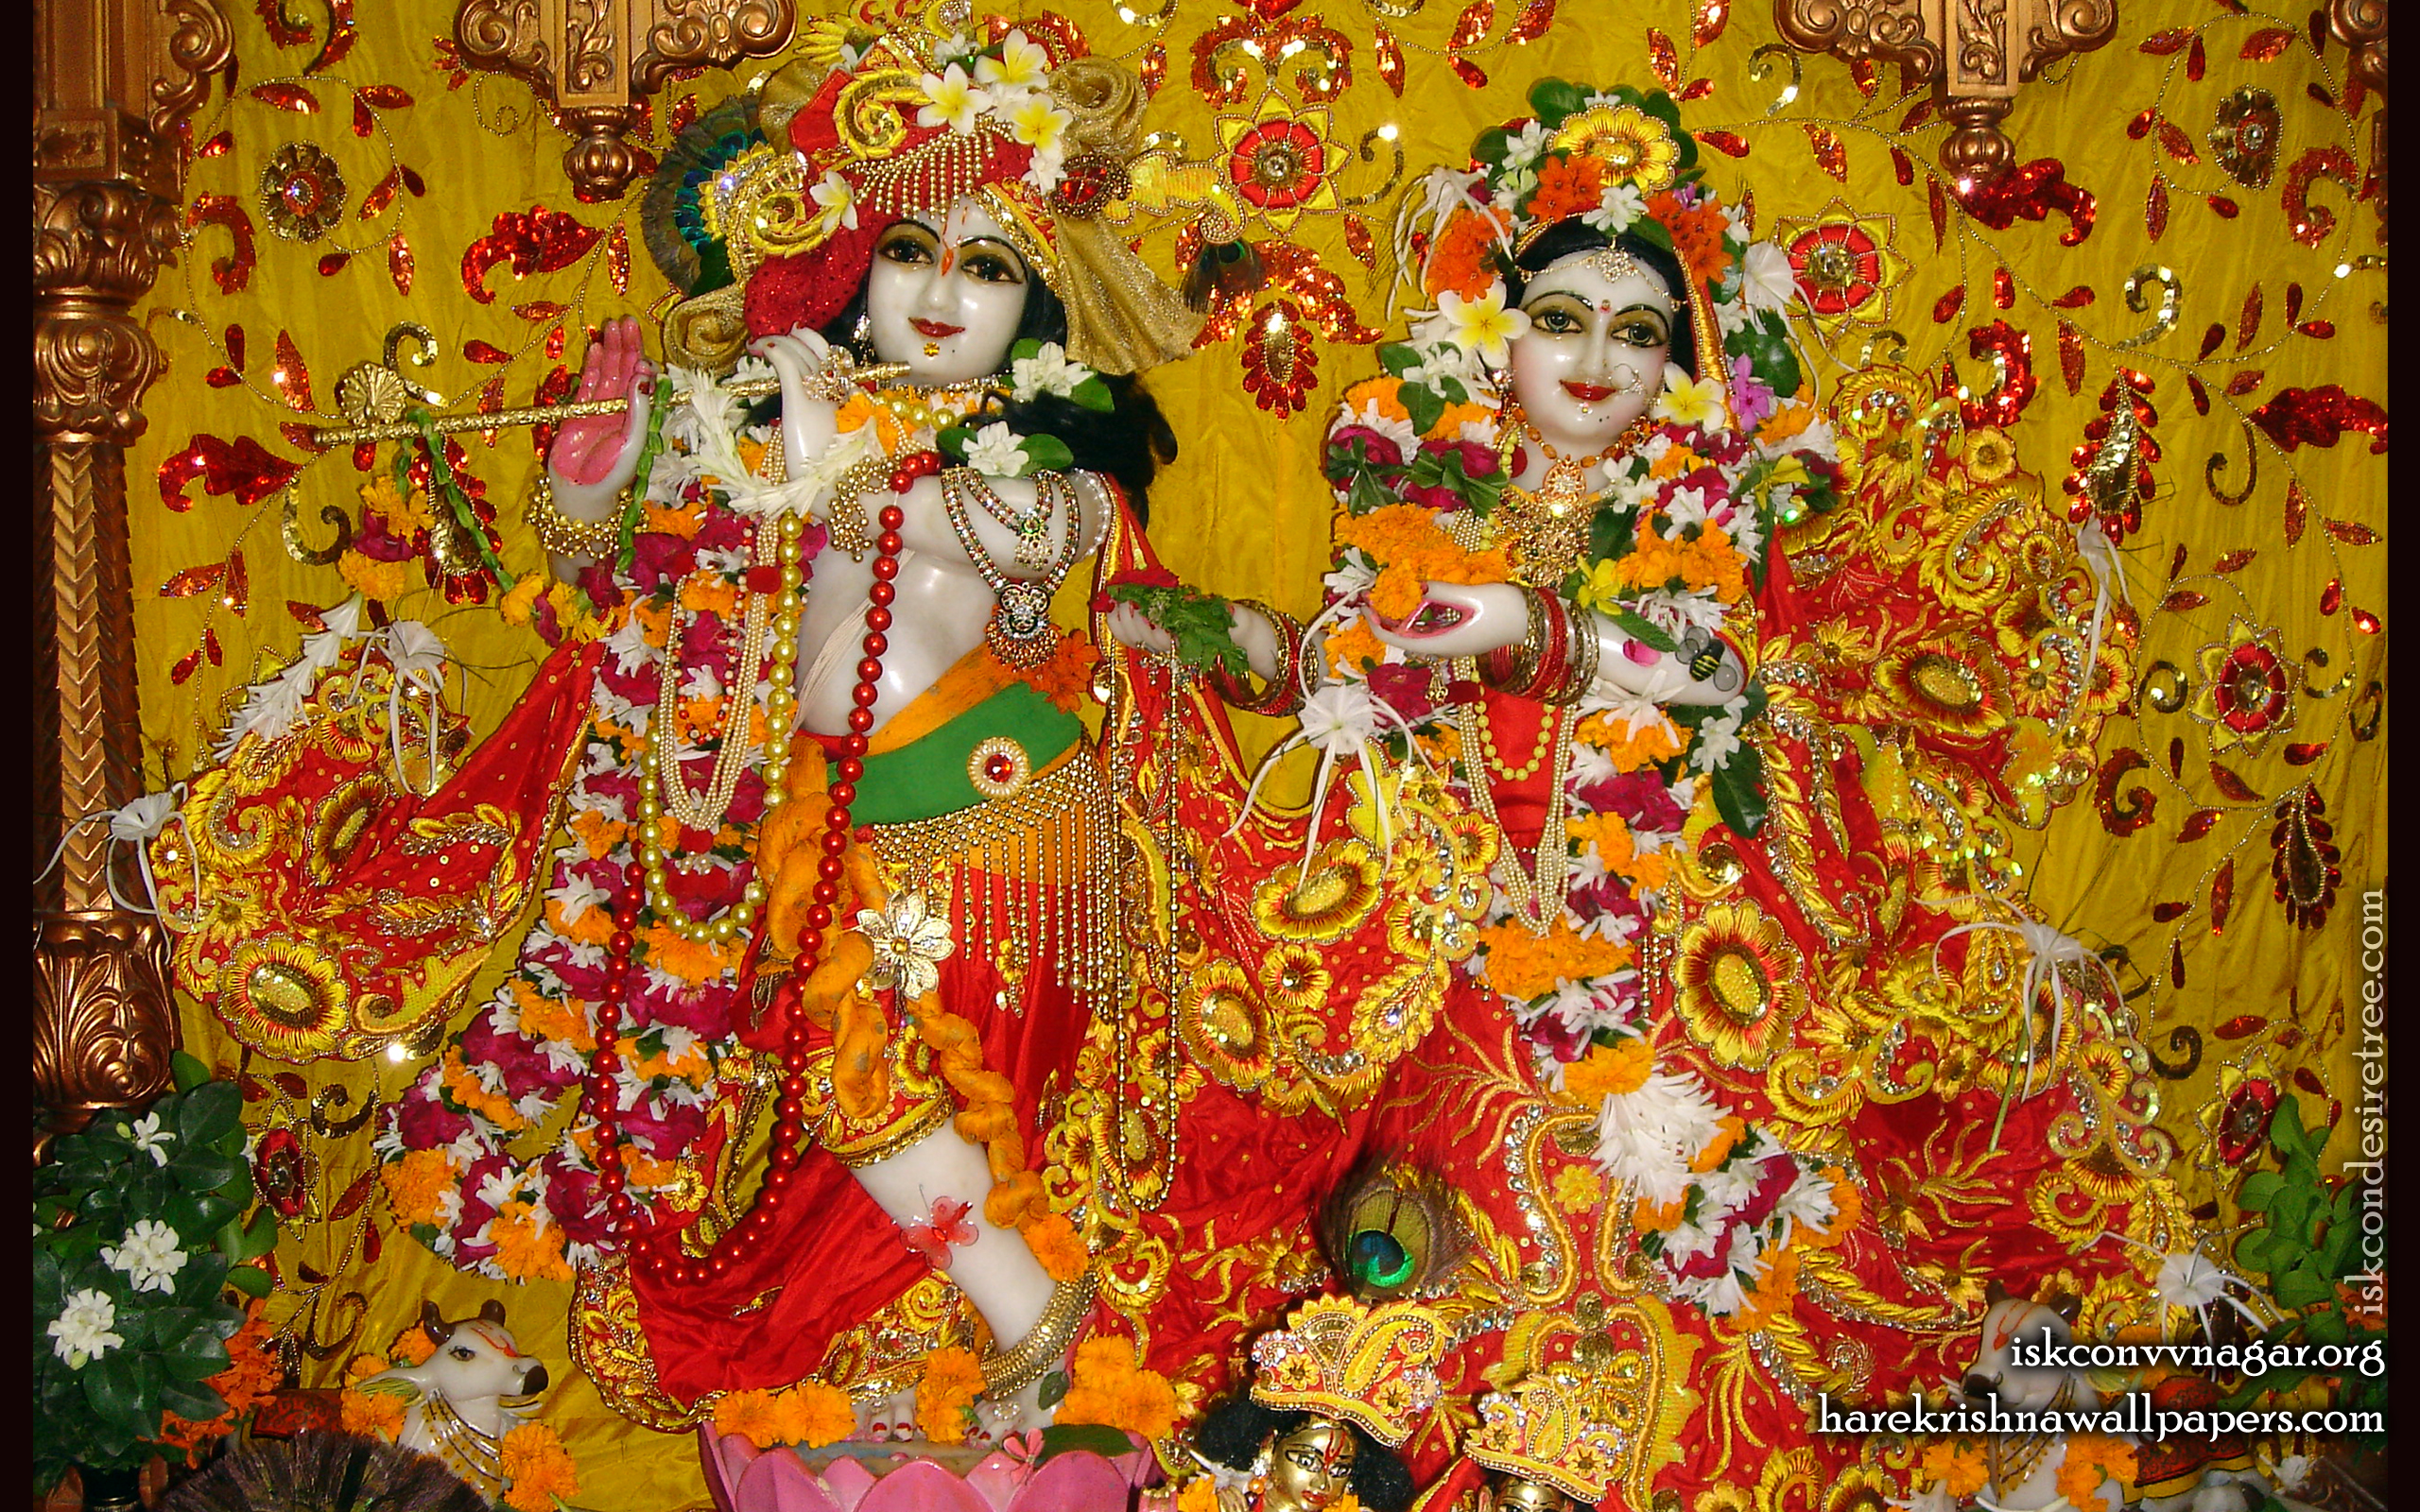 Sri Sri Radha Giridhari Wallpaper (024) Size 2560x1600 Download